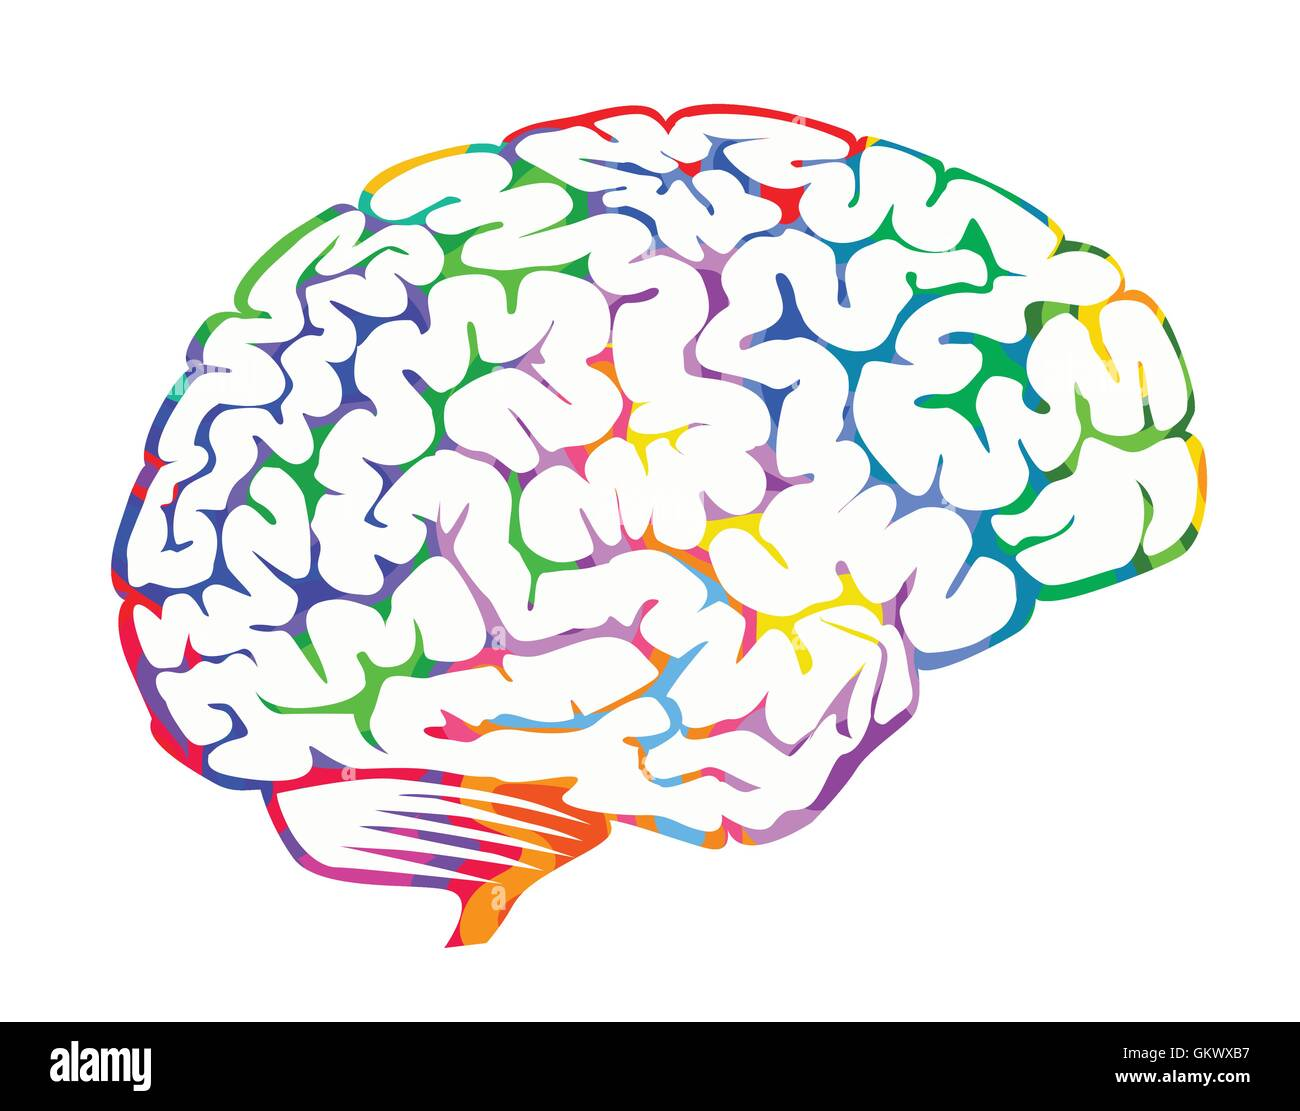 Brainwaves - Stock Image